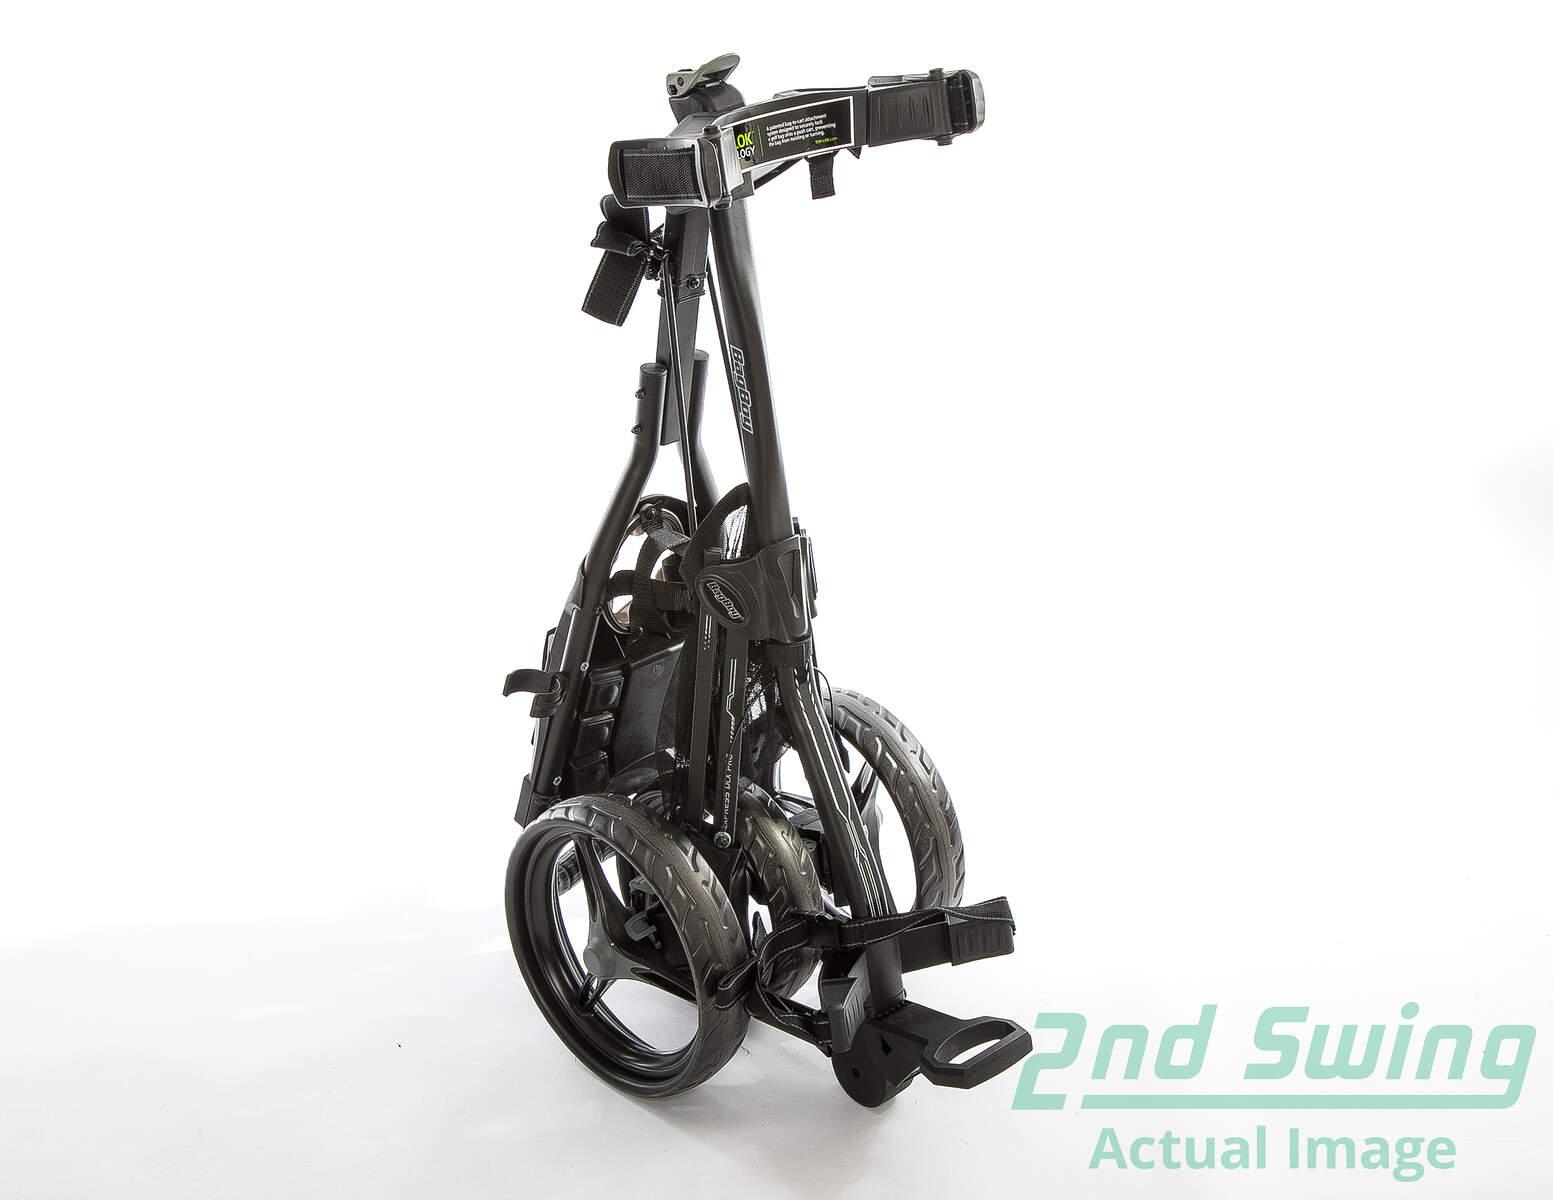 Bag Boy Express DLX Pro Push and Pull Cart | 2nd Swing Golf